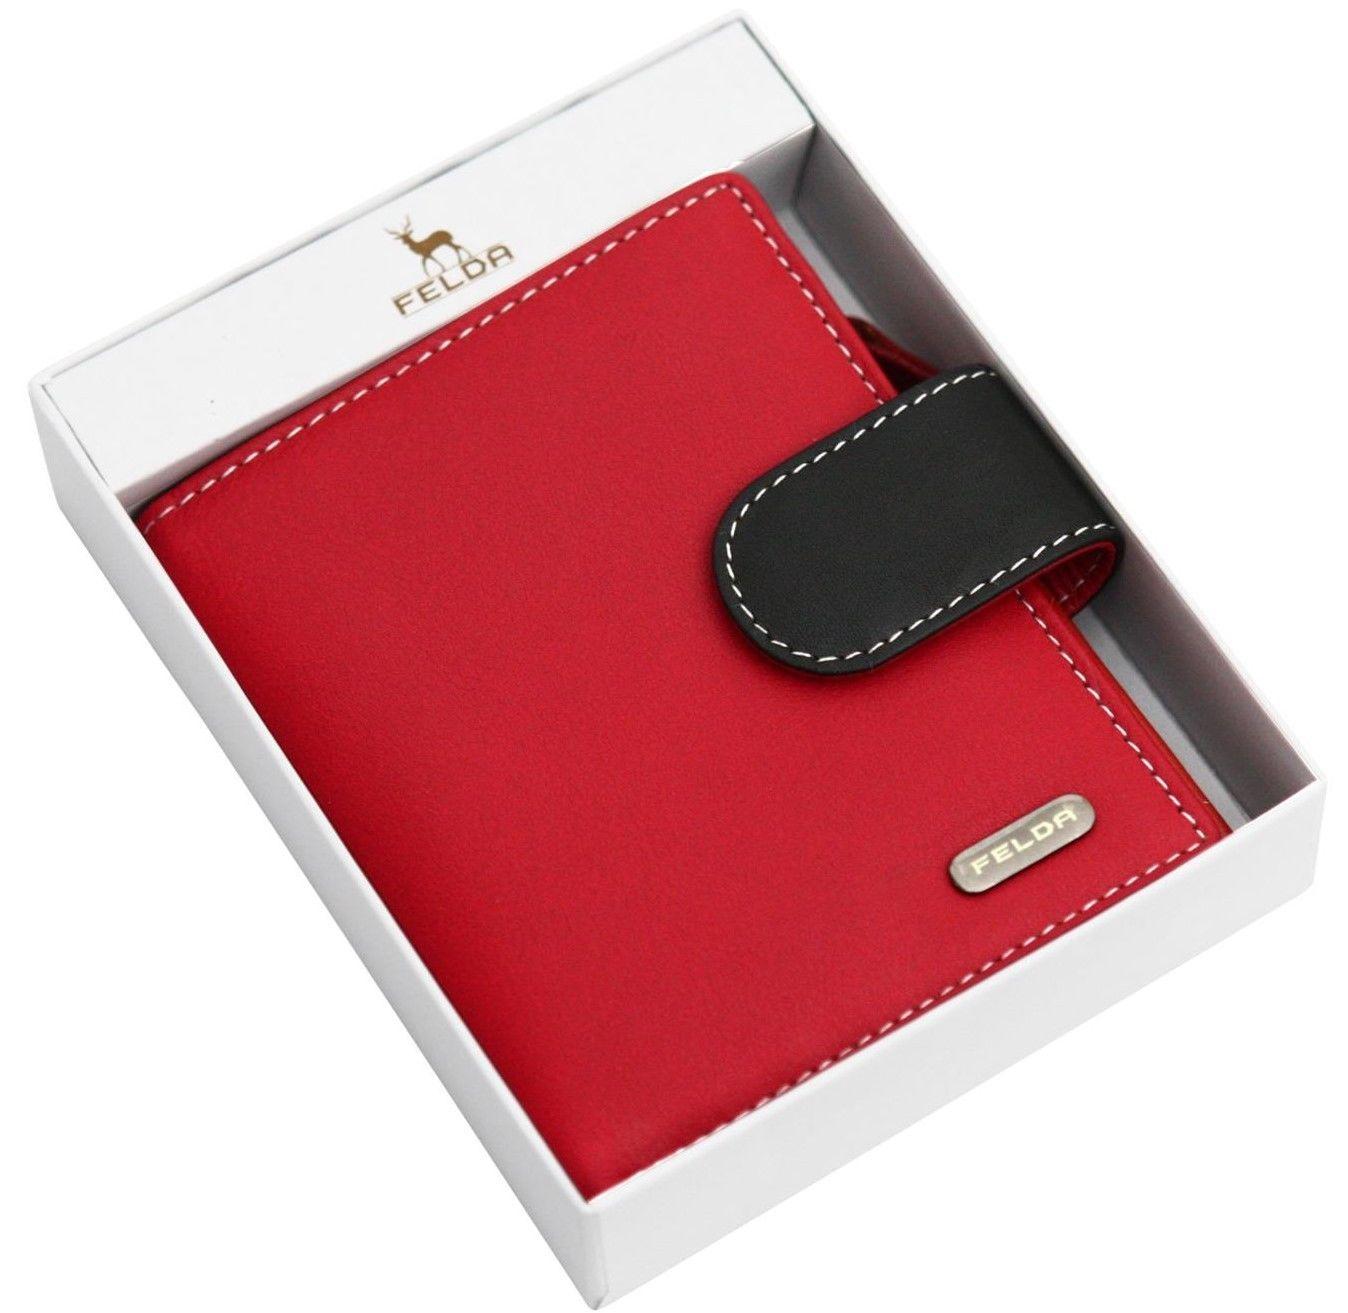 Felda-RFID-onorevoli-MEDAGLIA-amp-Card-Purse-Wallet-Genuine-Leather-Multi-SOFT-BOX-REGALO miniatura 108